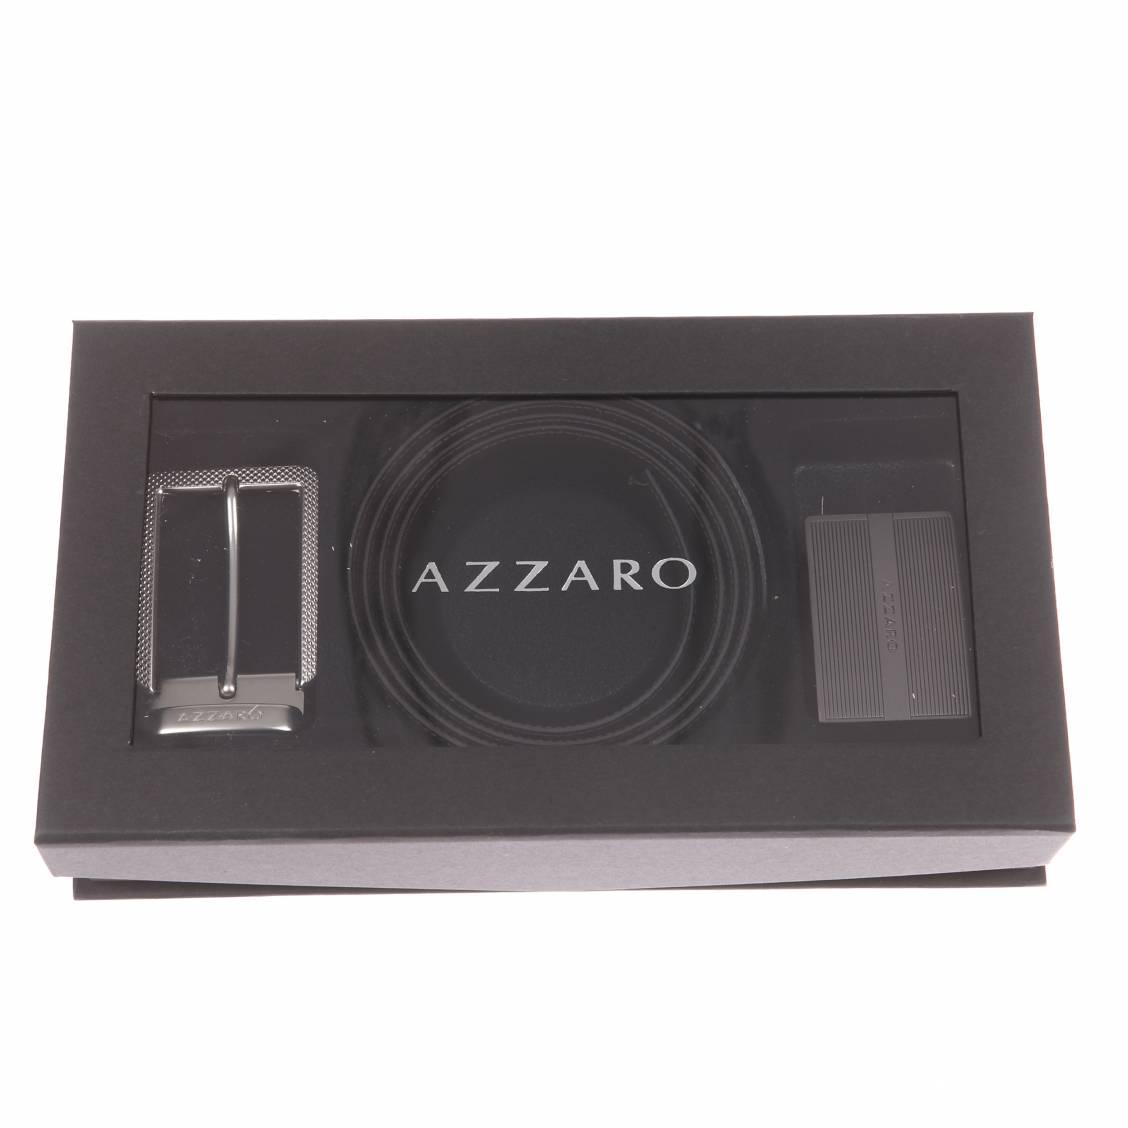 905f6229eb1 Coffret cadeau   ceinture Azzaro ajustable